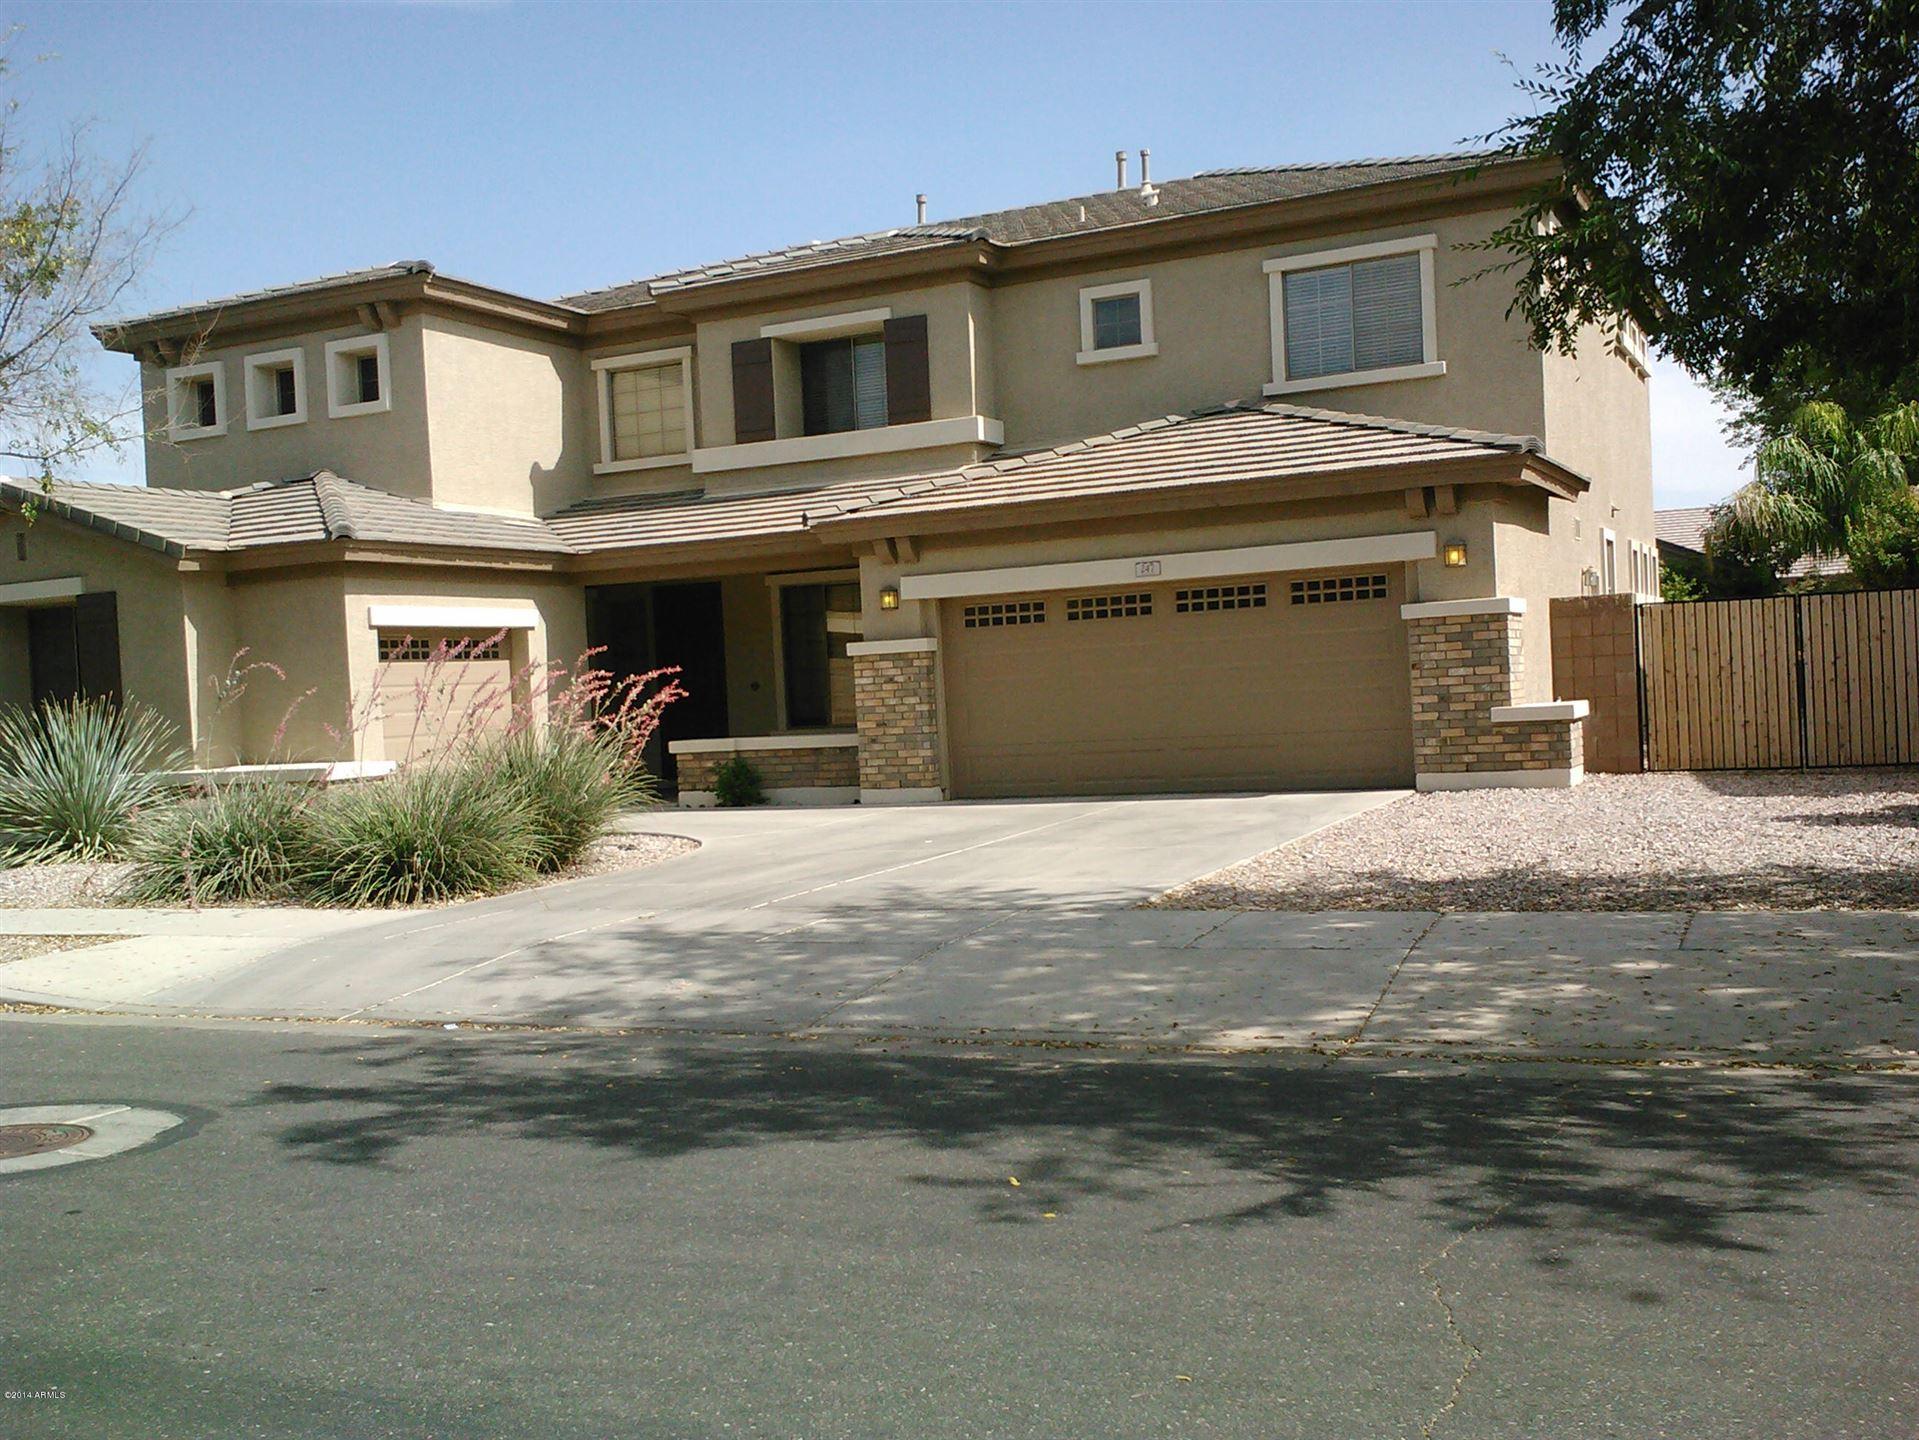 247 W SWAN Drive, Chandler, AZ 85286 - MLS#: 6135374